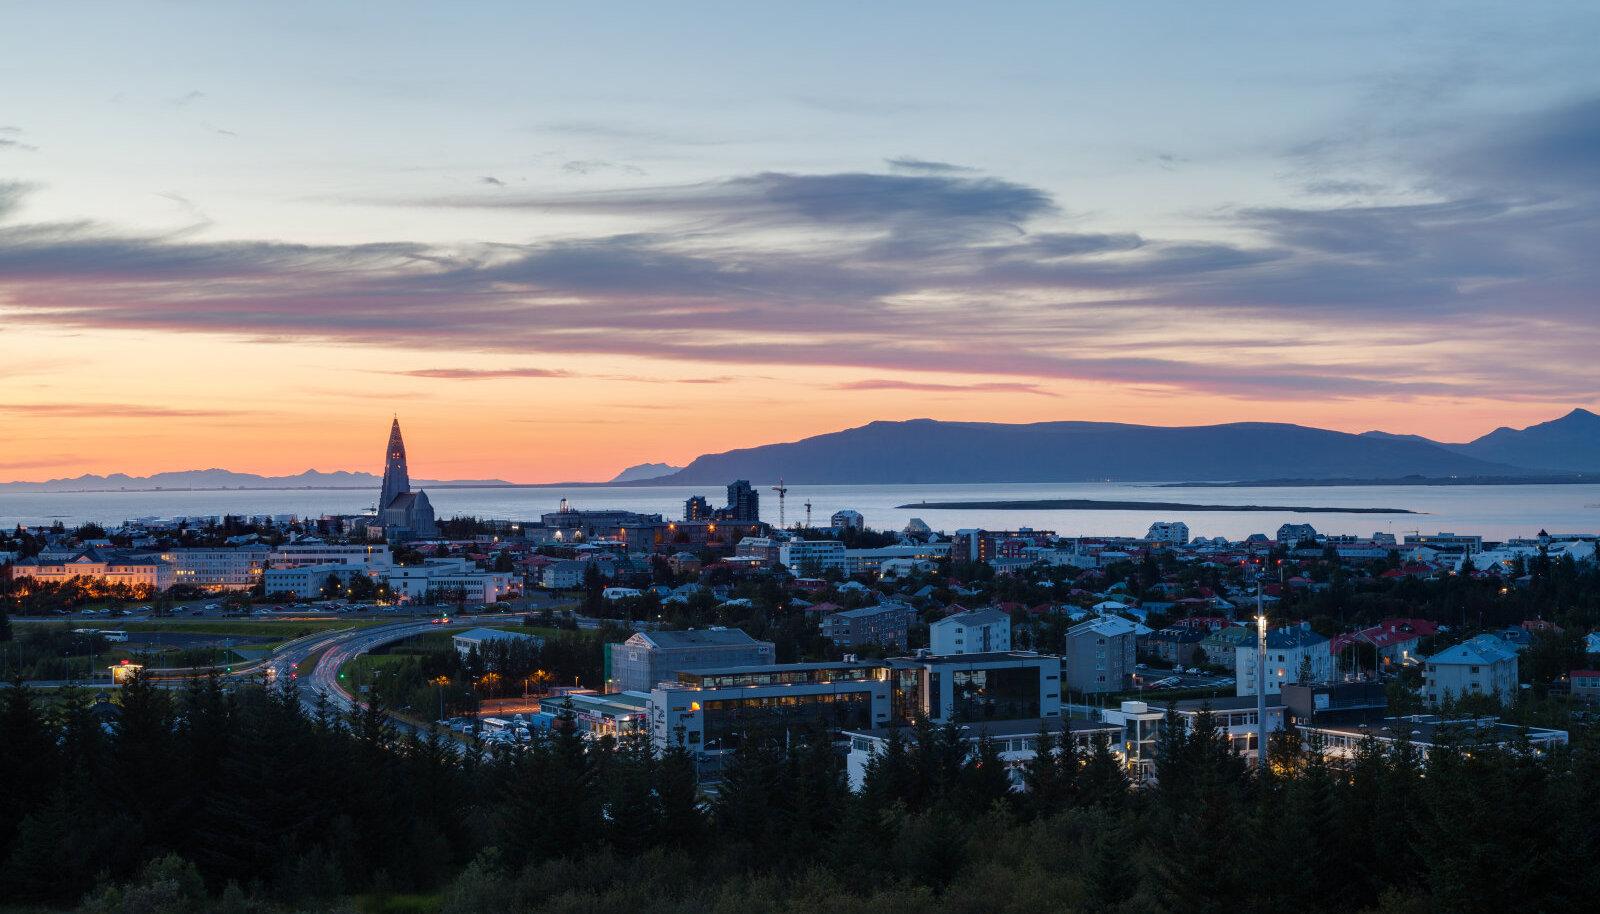 Islandi pealinn Reykjavik (foto: Diego Delso / CC BY-SA 4.0 / Wikimedia Commons)